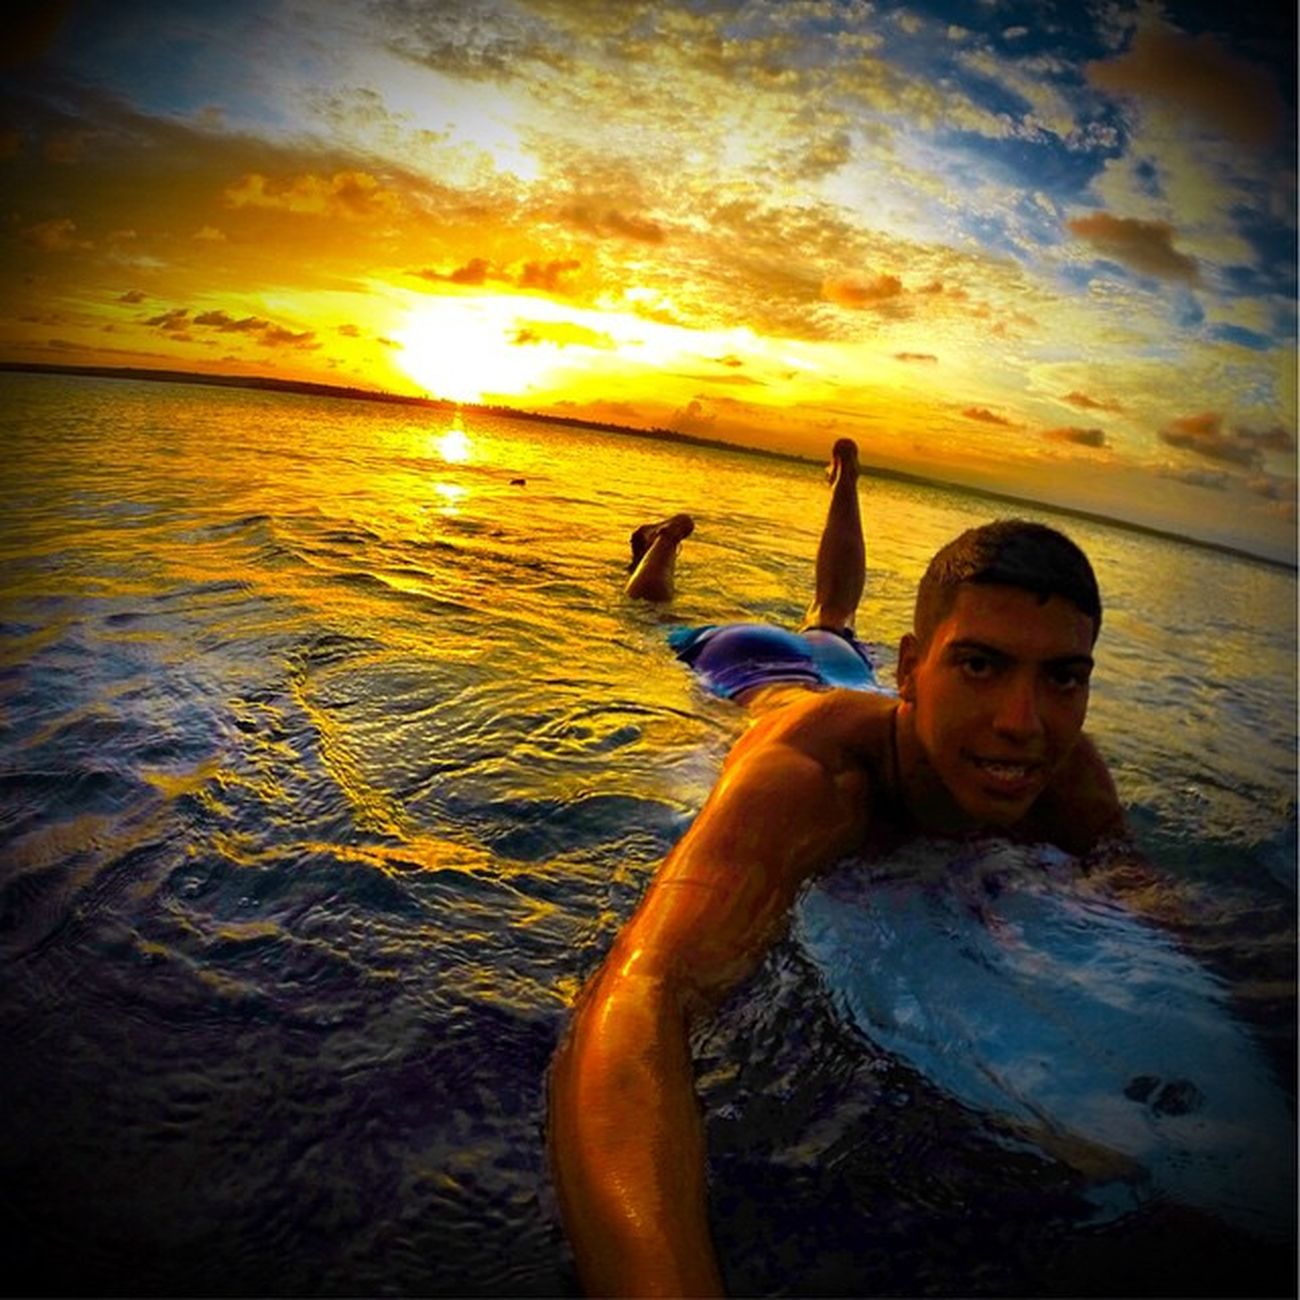 Por do sol! ⛅️👌 Allallauu Gopro Lifeapp Lifestyle LiveTheSearch Surf Surfstorm Surfingiseverything Rapaduratimes Dialindo @lifeapp Goprosurf Goprohero4 Goprobrasil Goproselfies Life @GoPro